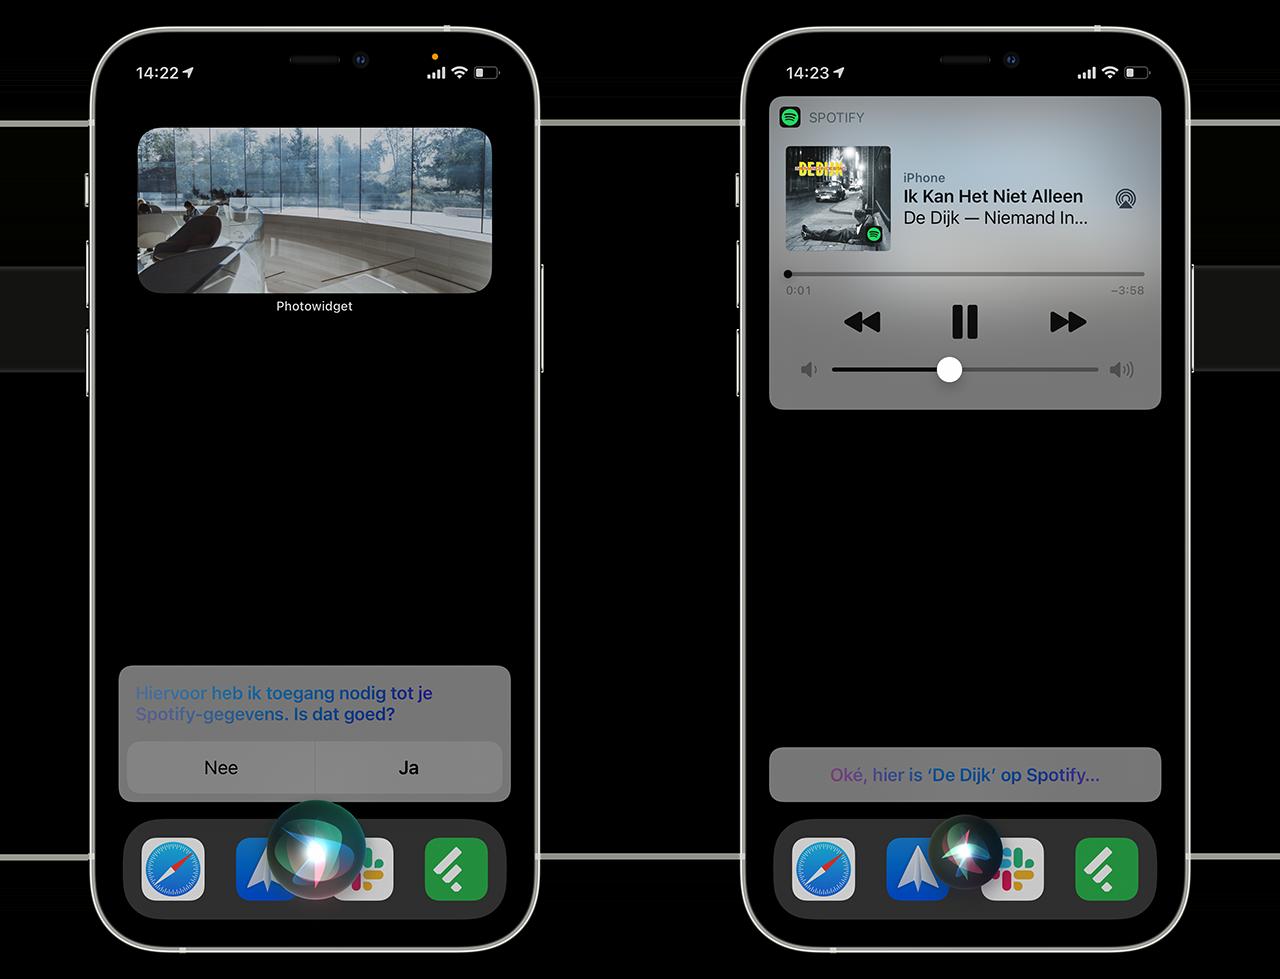 Siri muziek afspelen met Spotify